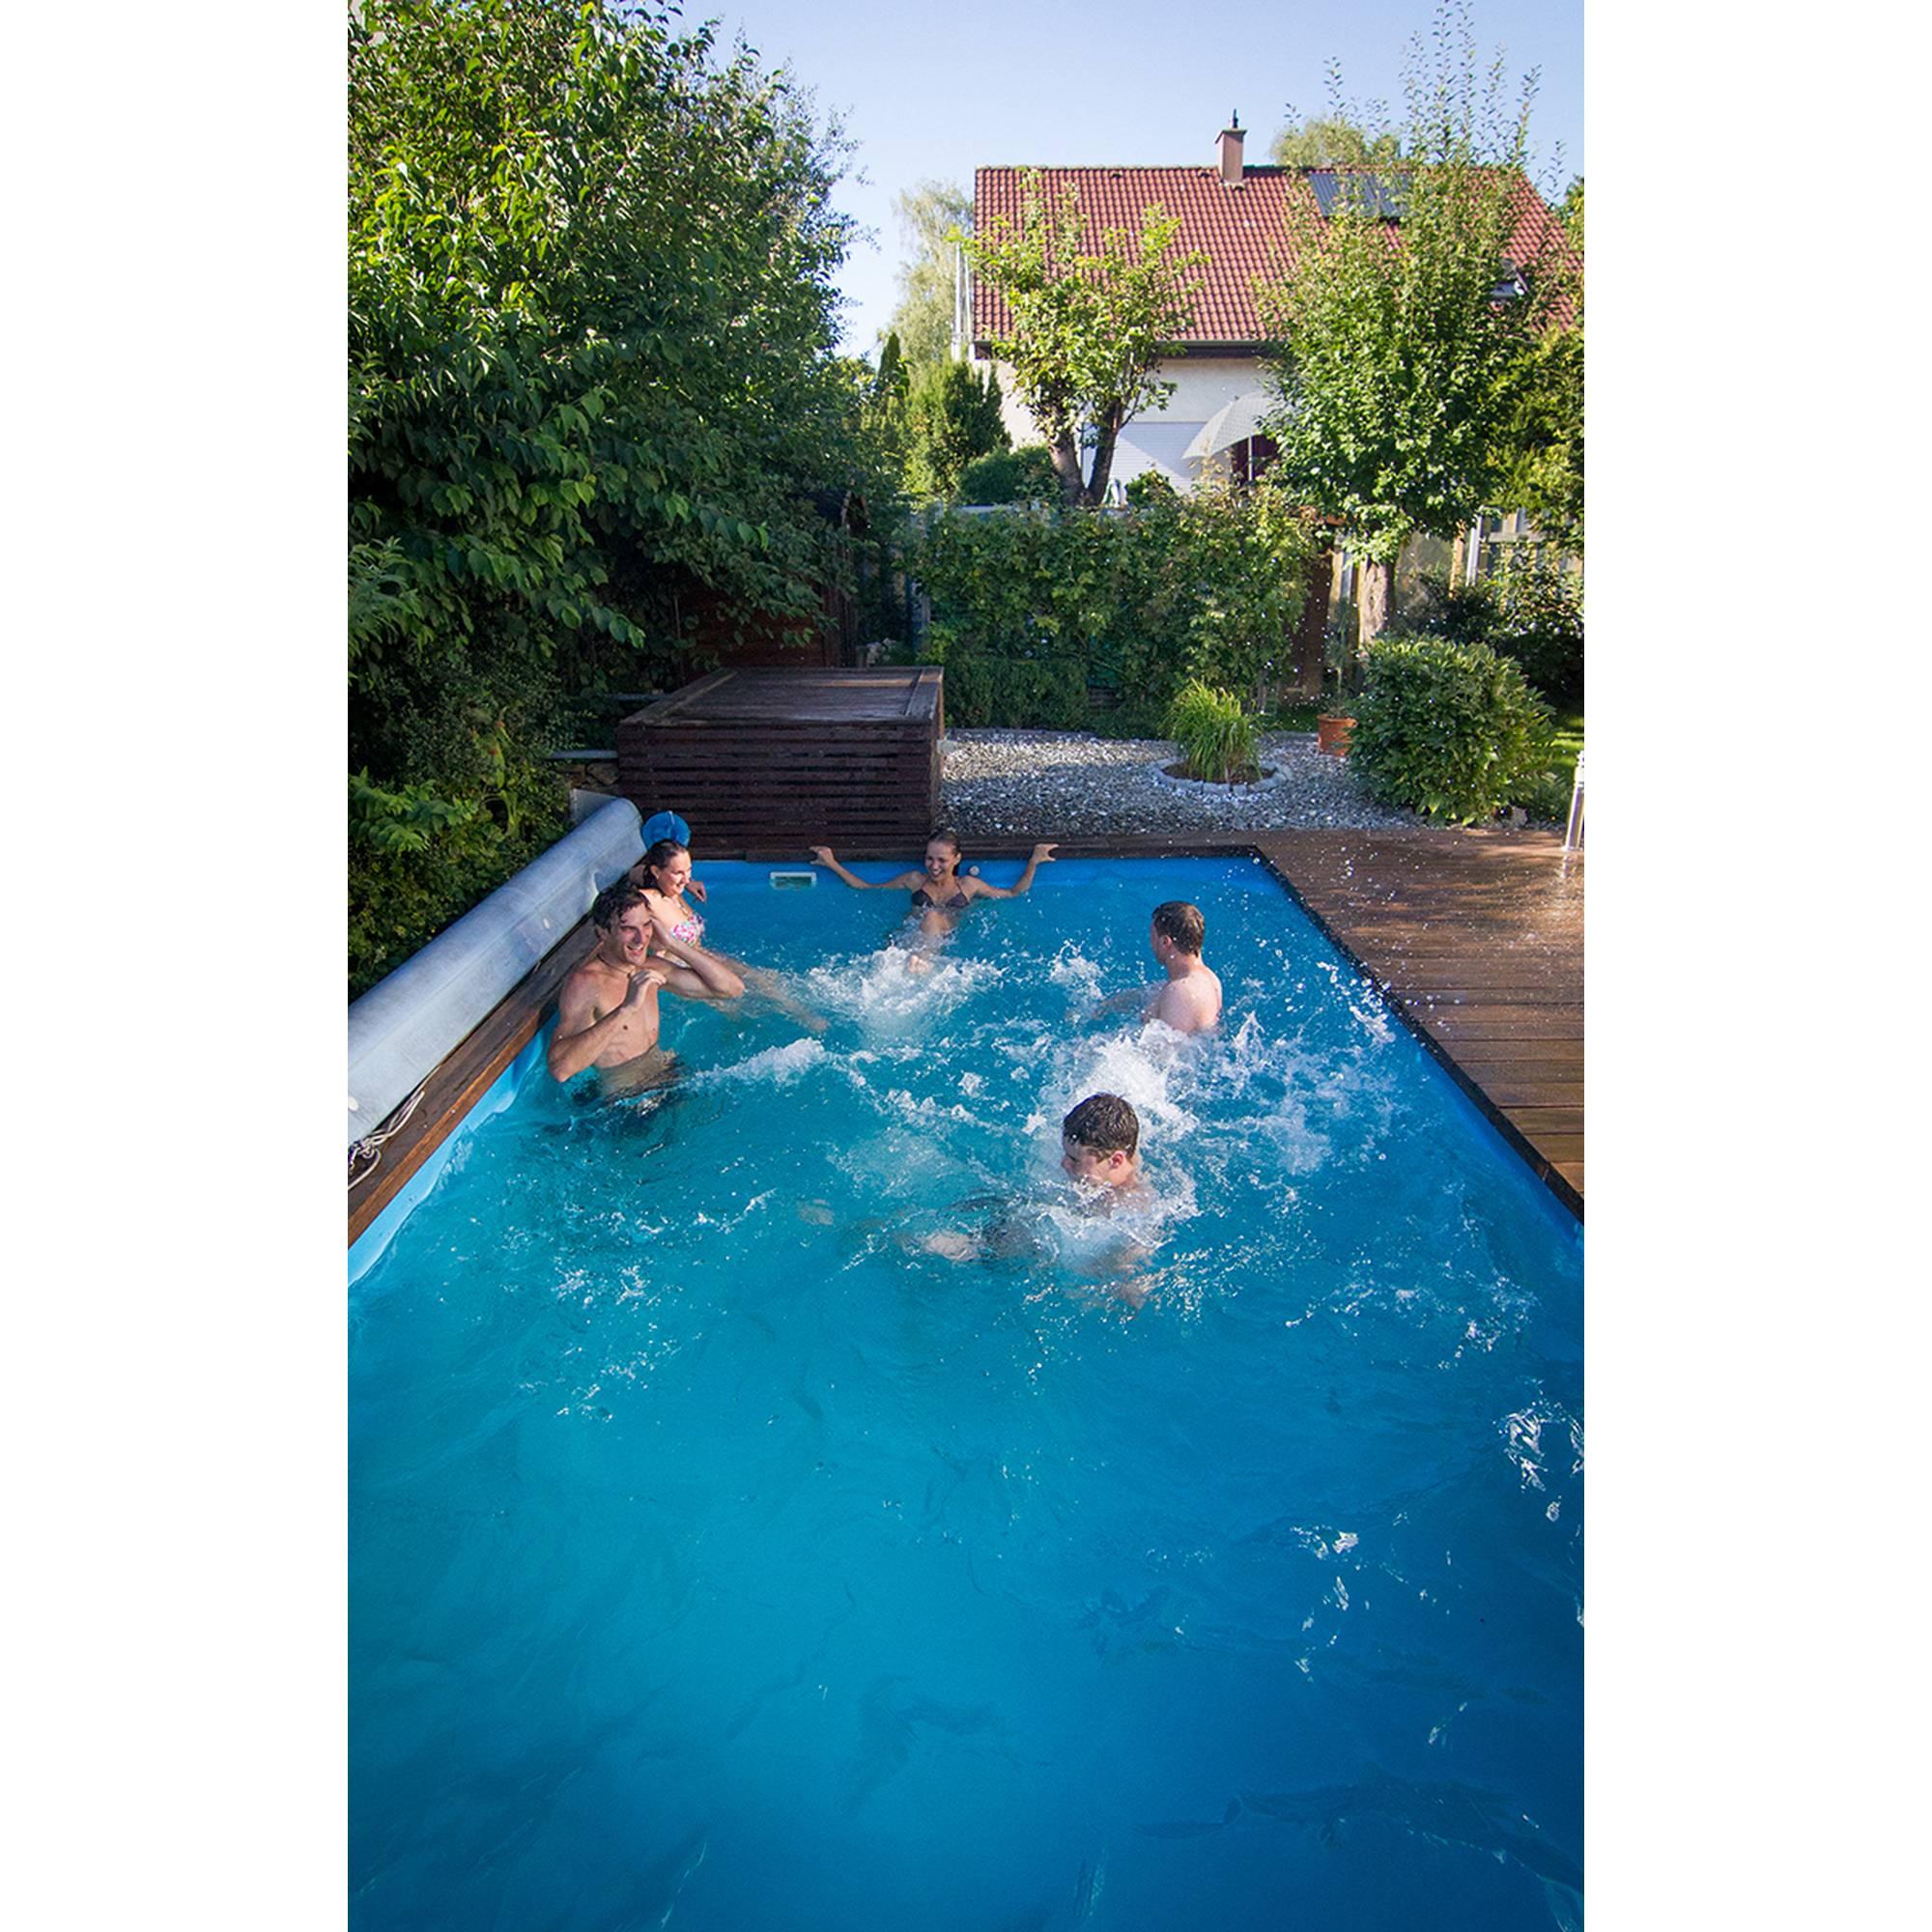 Pool ersatzfolie versch gr en einh ngebiese blau 0 for Hersteller poolfolien